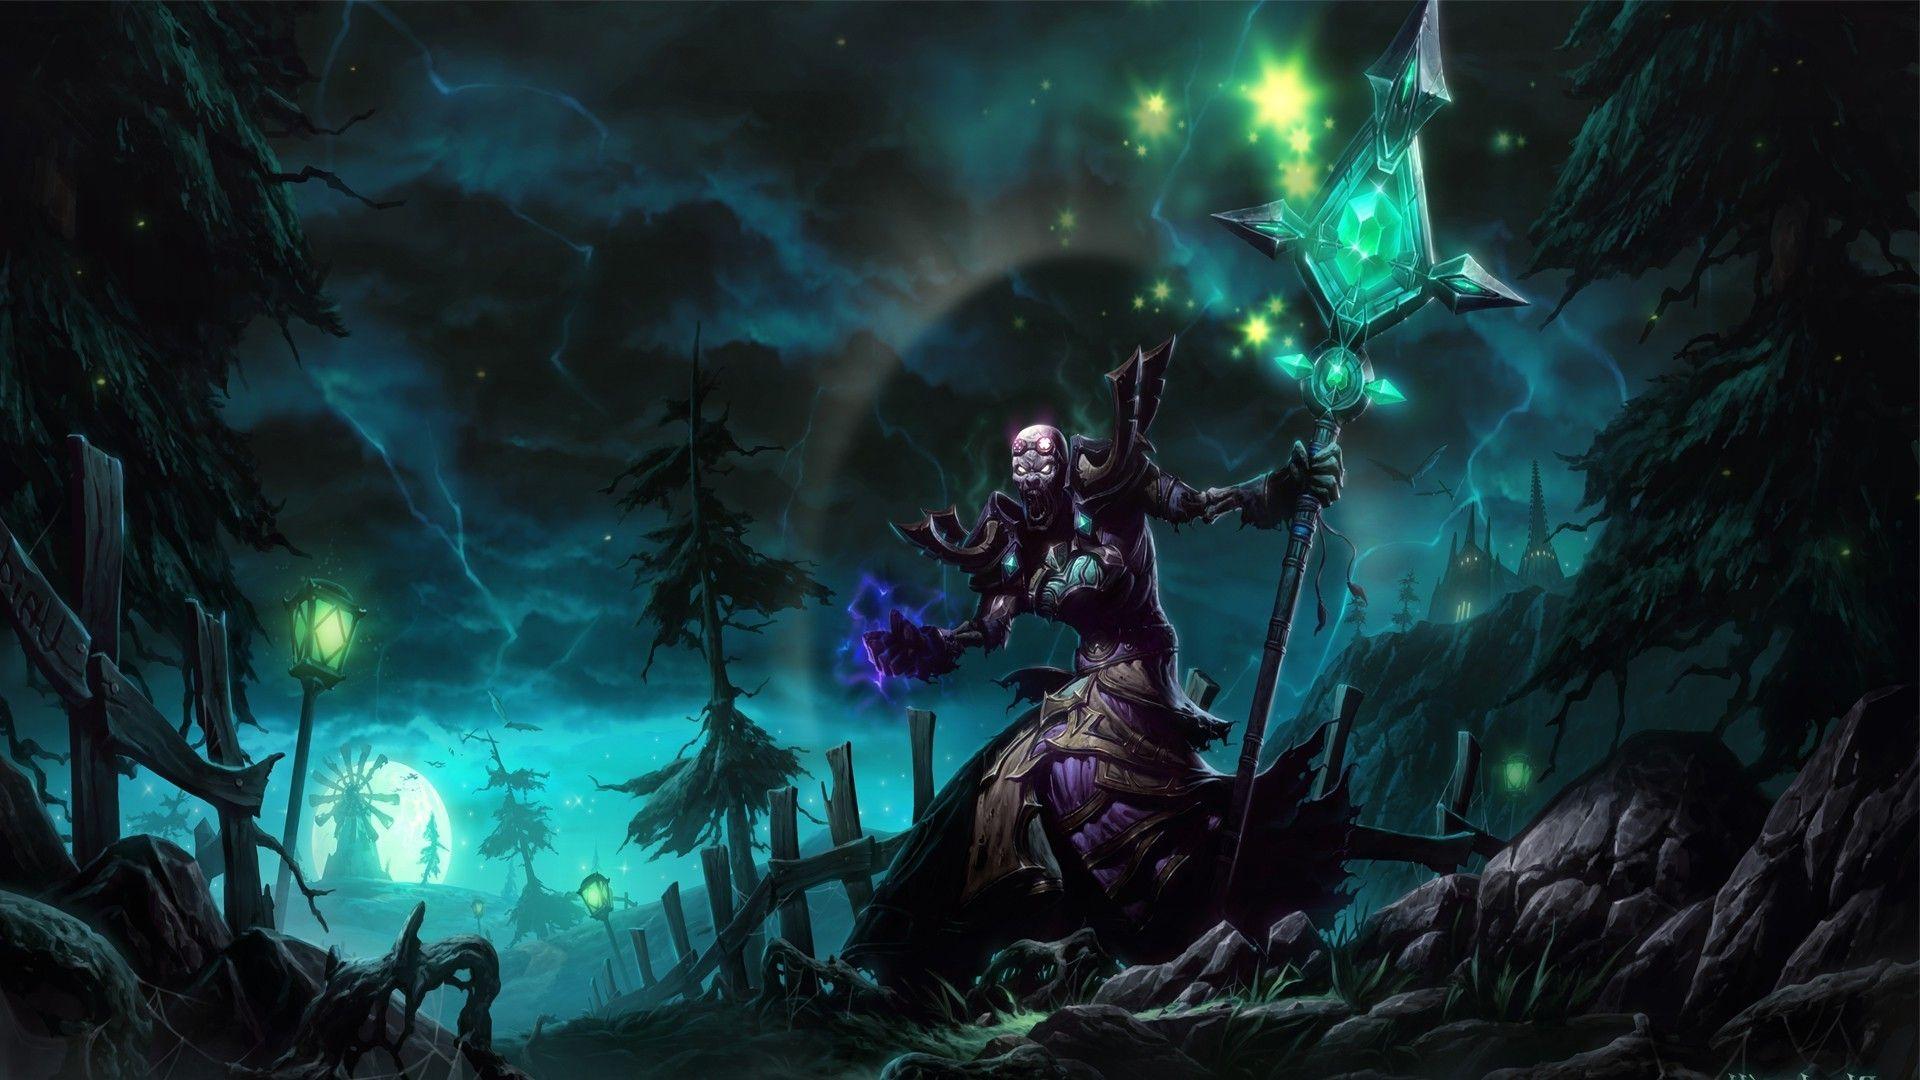 Mage World Of Warcraft Wallpaper World Of Warcraft Wallpaper Warcraft World Of Warcraft